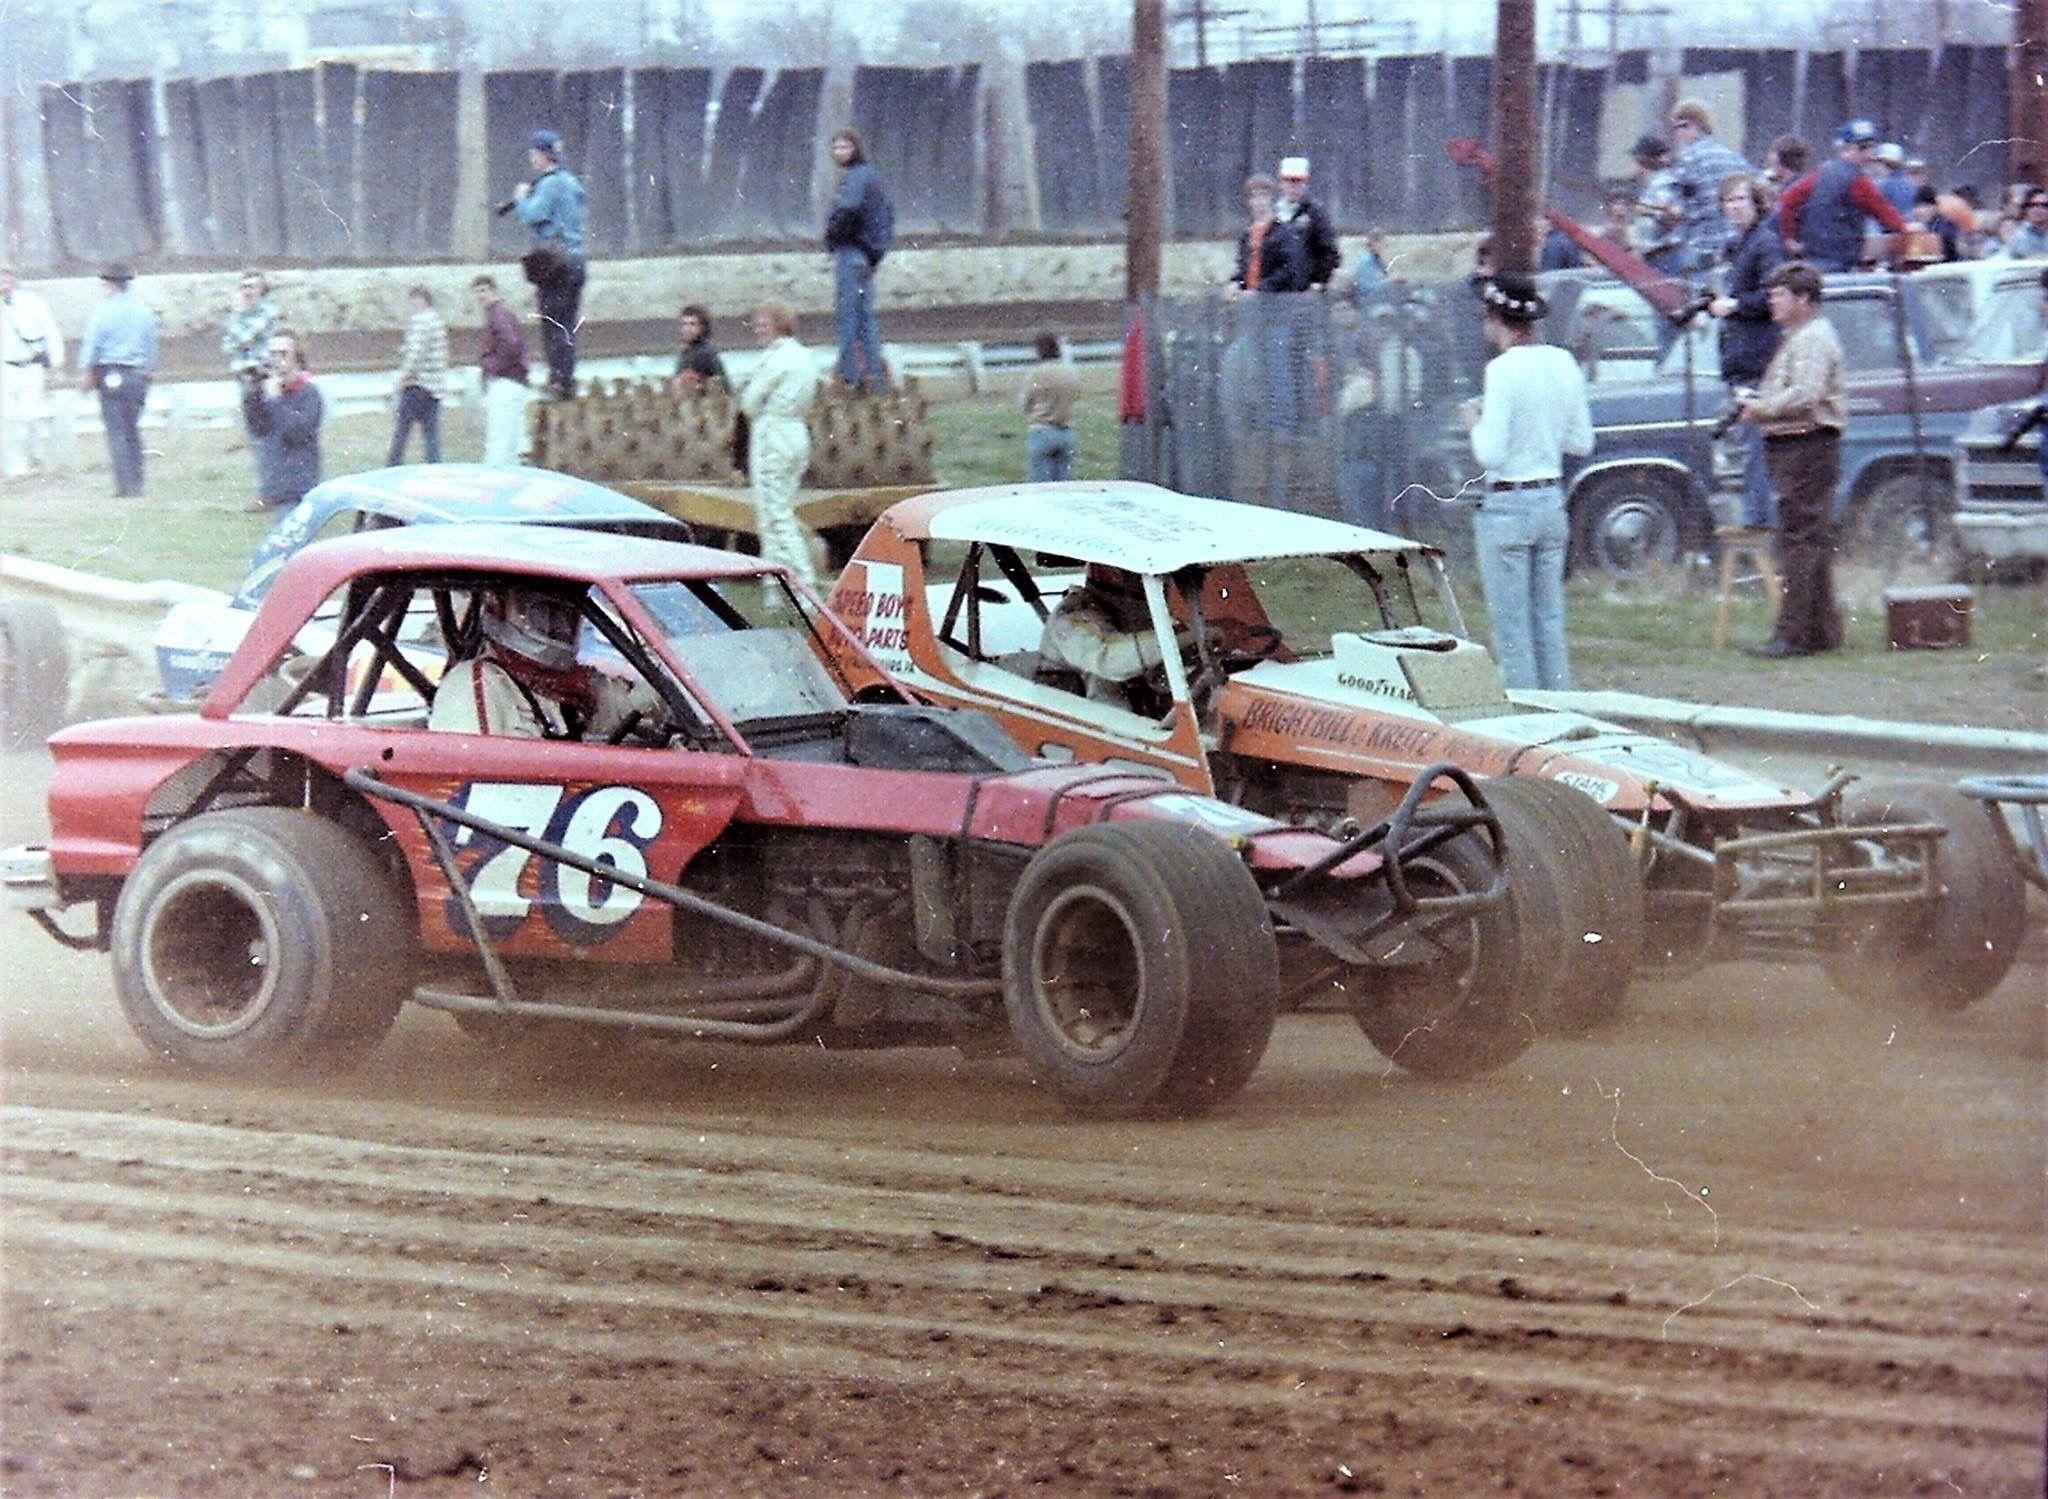 Pin by Jeff Swartz on Racing | Dirt car racing, Old race